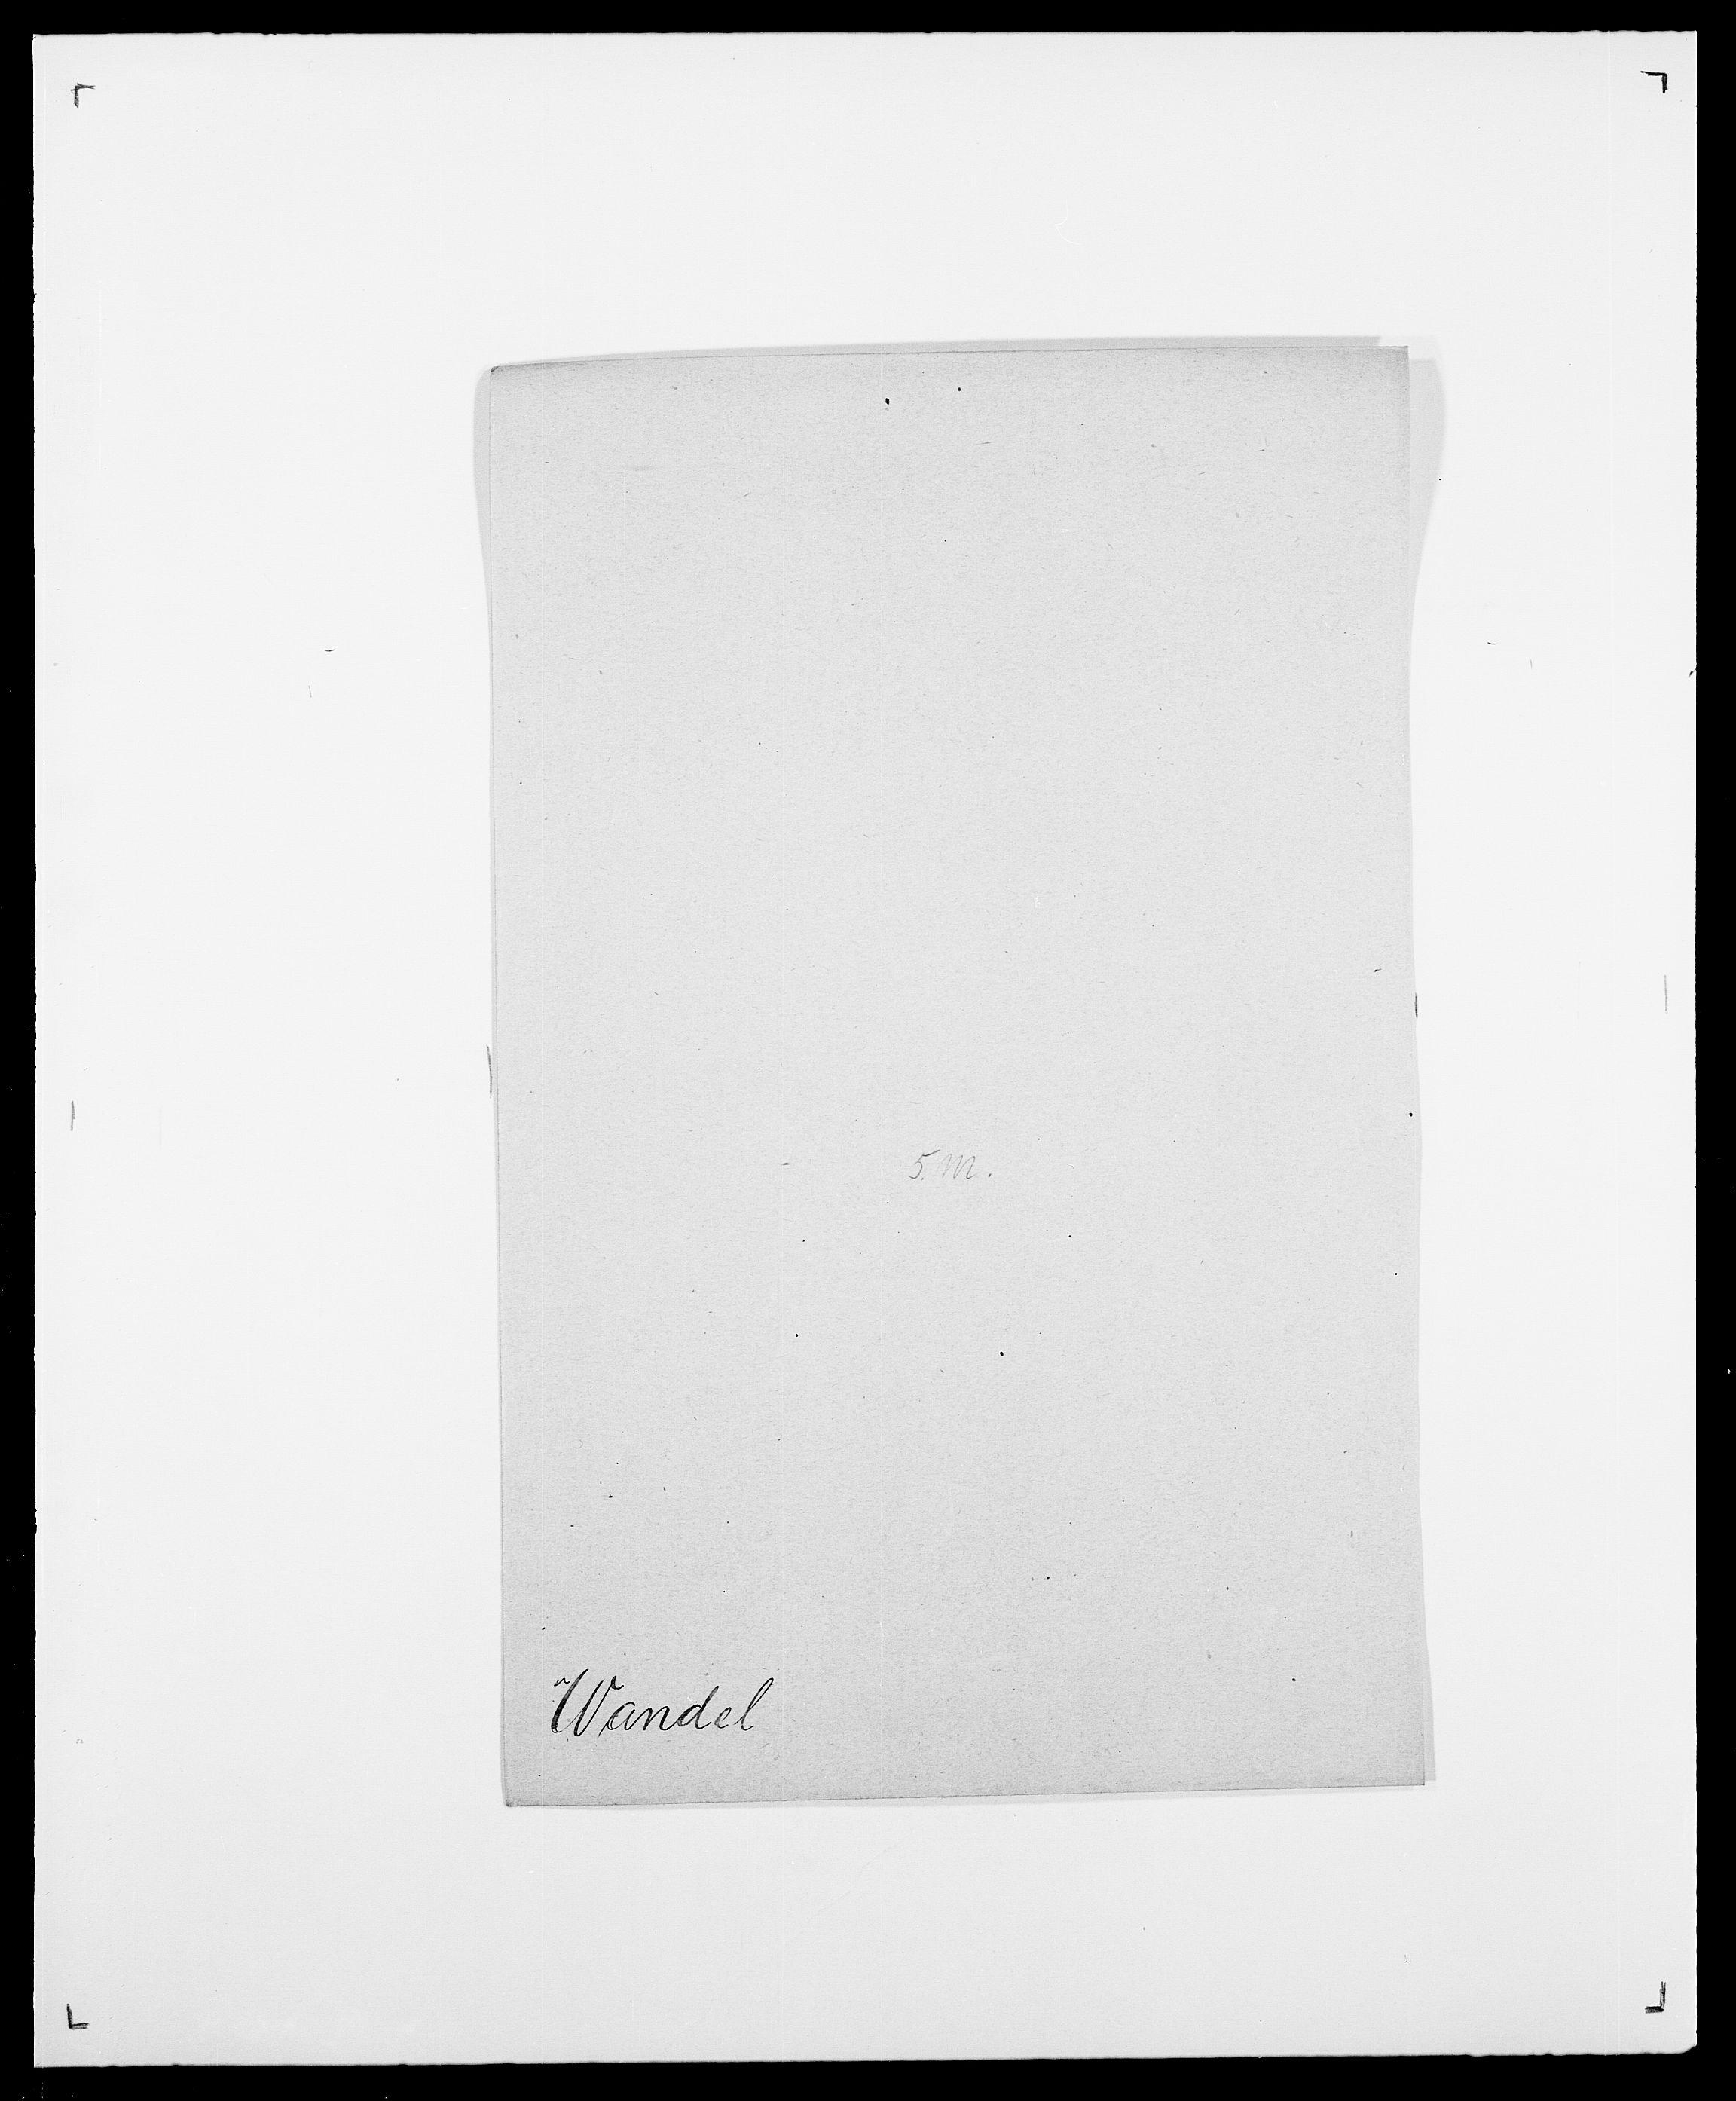 SAO, Delgobe, Charles Antoine - samling, D/Da/L0040: Usgaard - Velund, s. 275